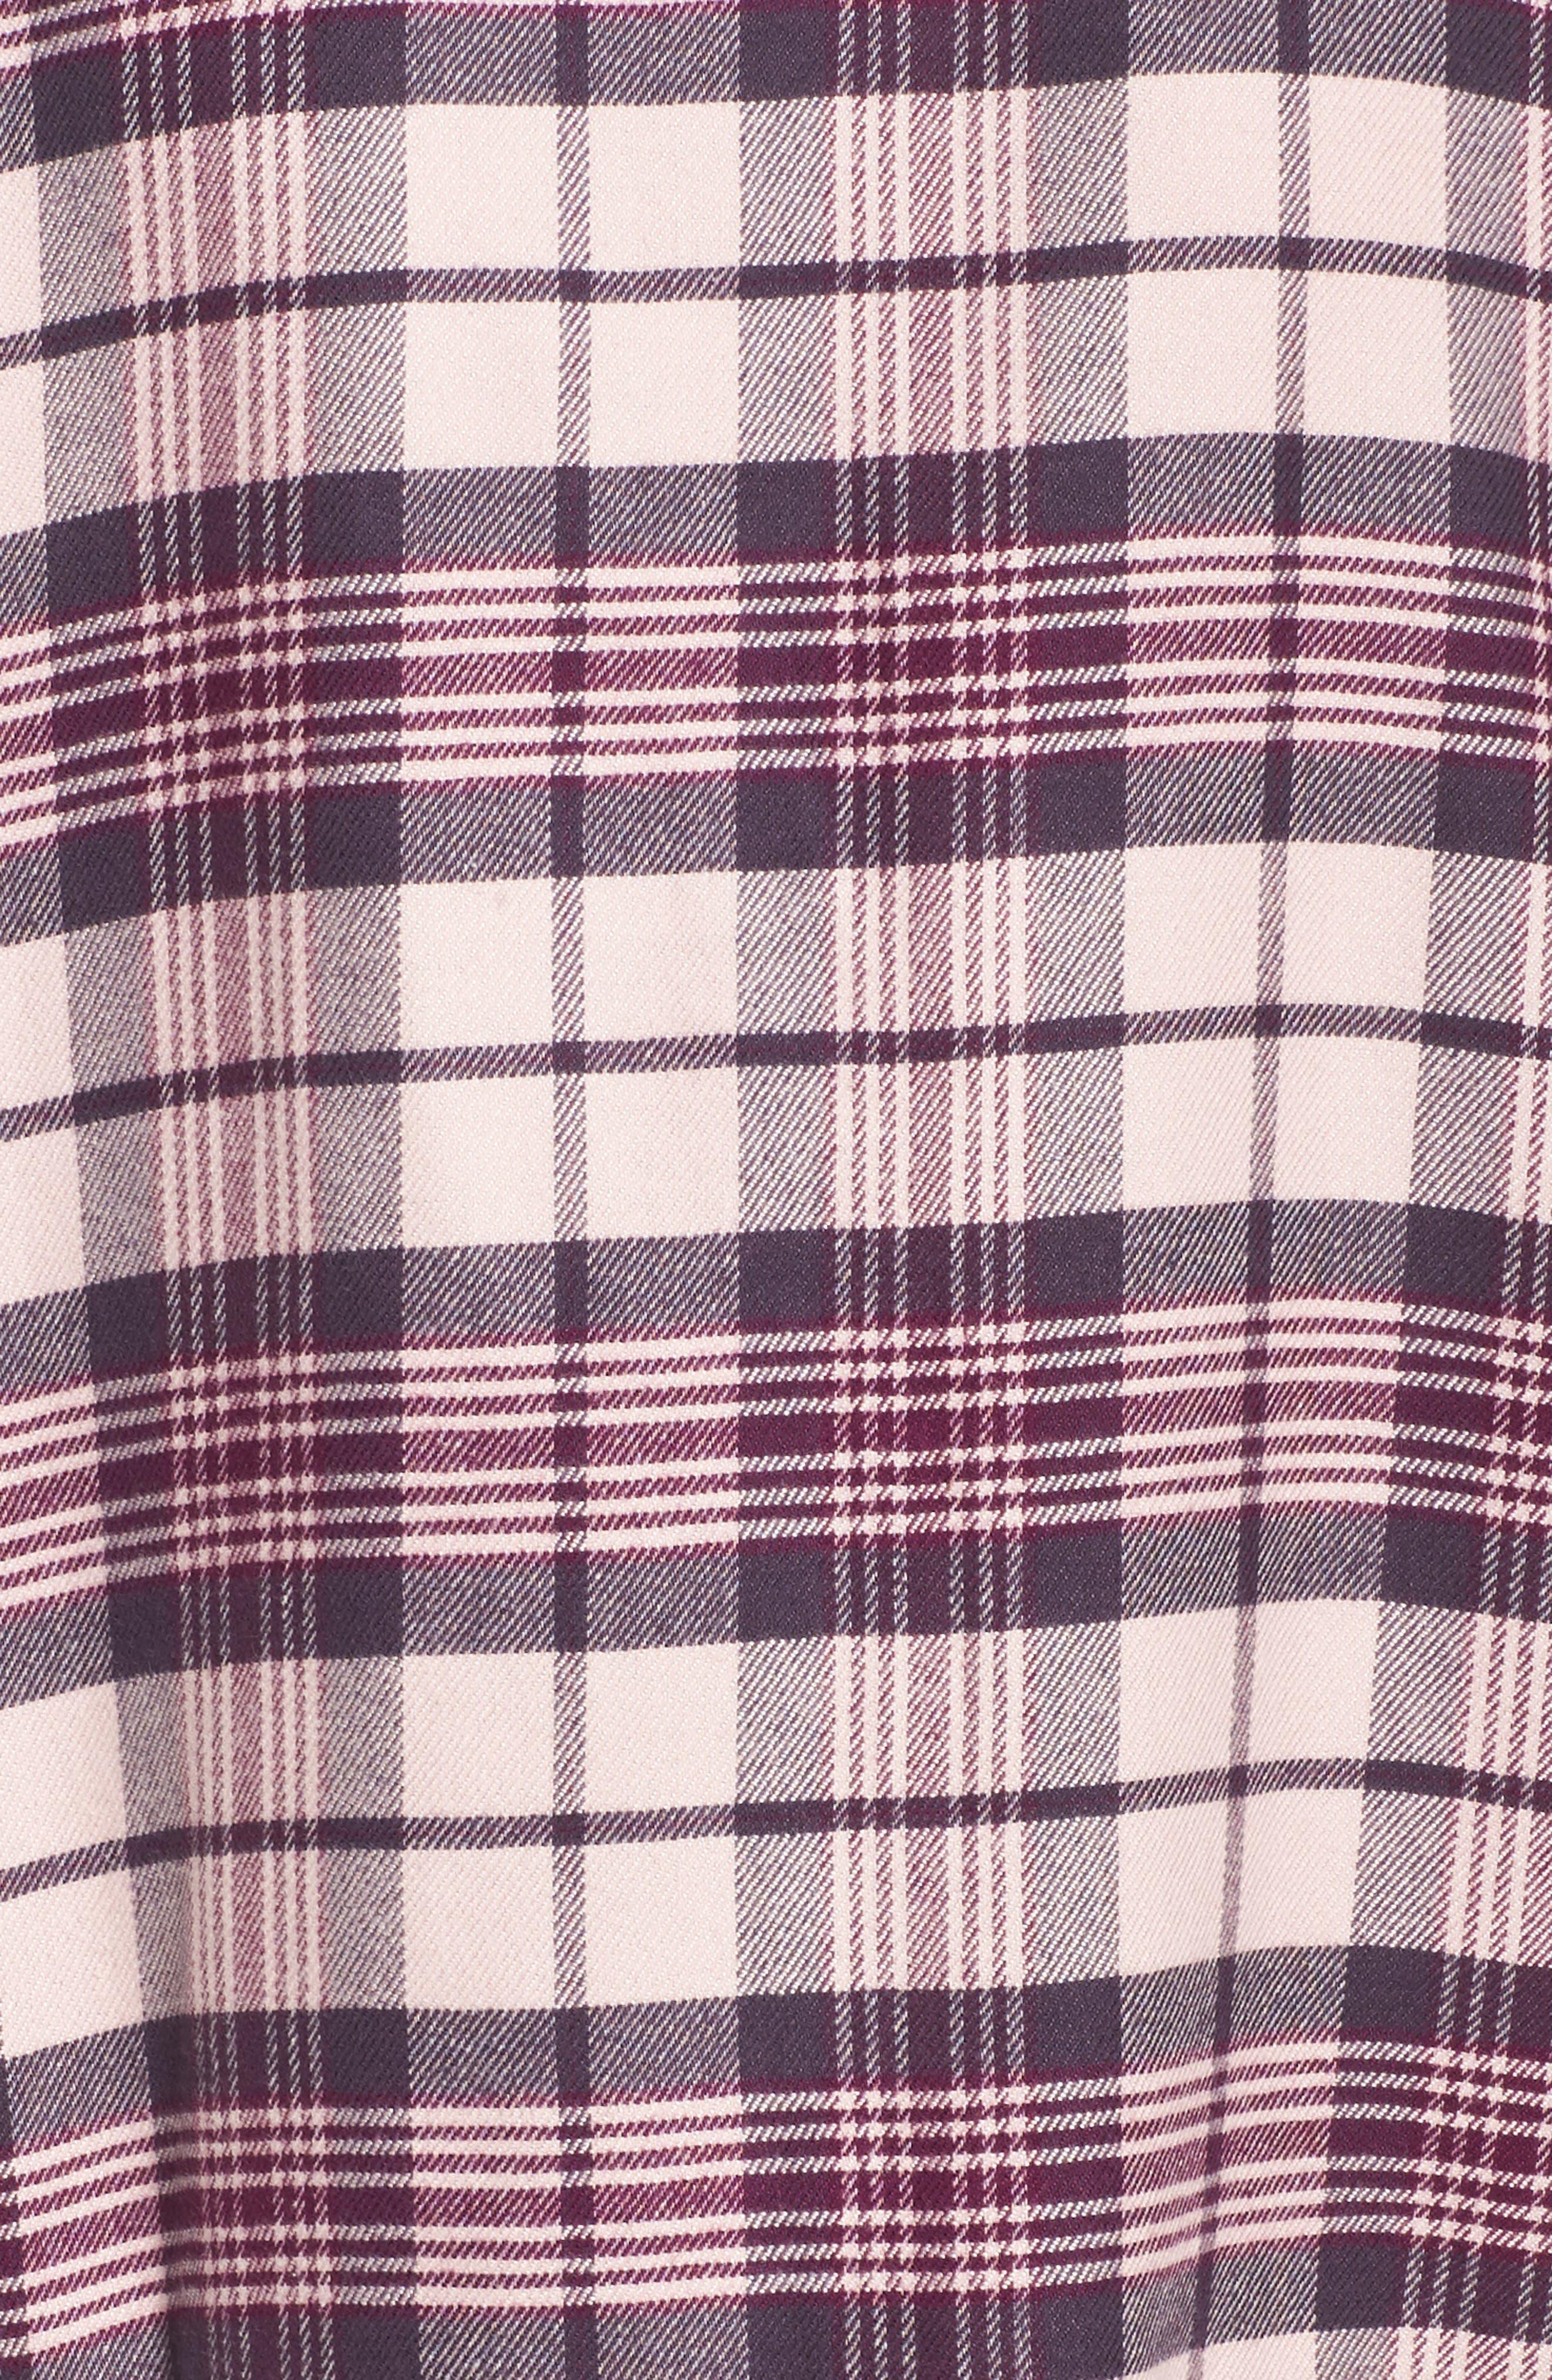 Lingerie Starlight Flannel Pajamas,                             Alternate thumbnail 5, color,                             Pink Peony Bud Tonal Tartan